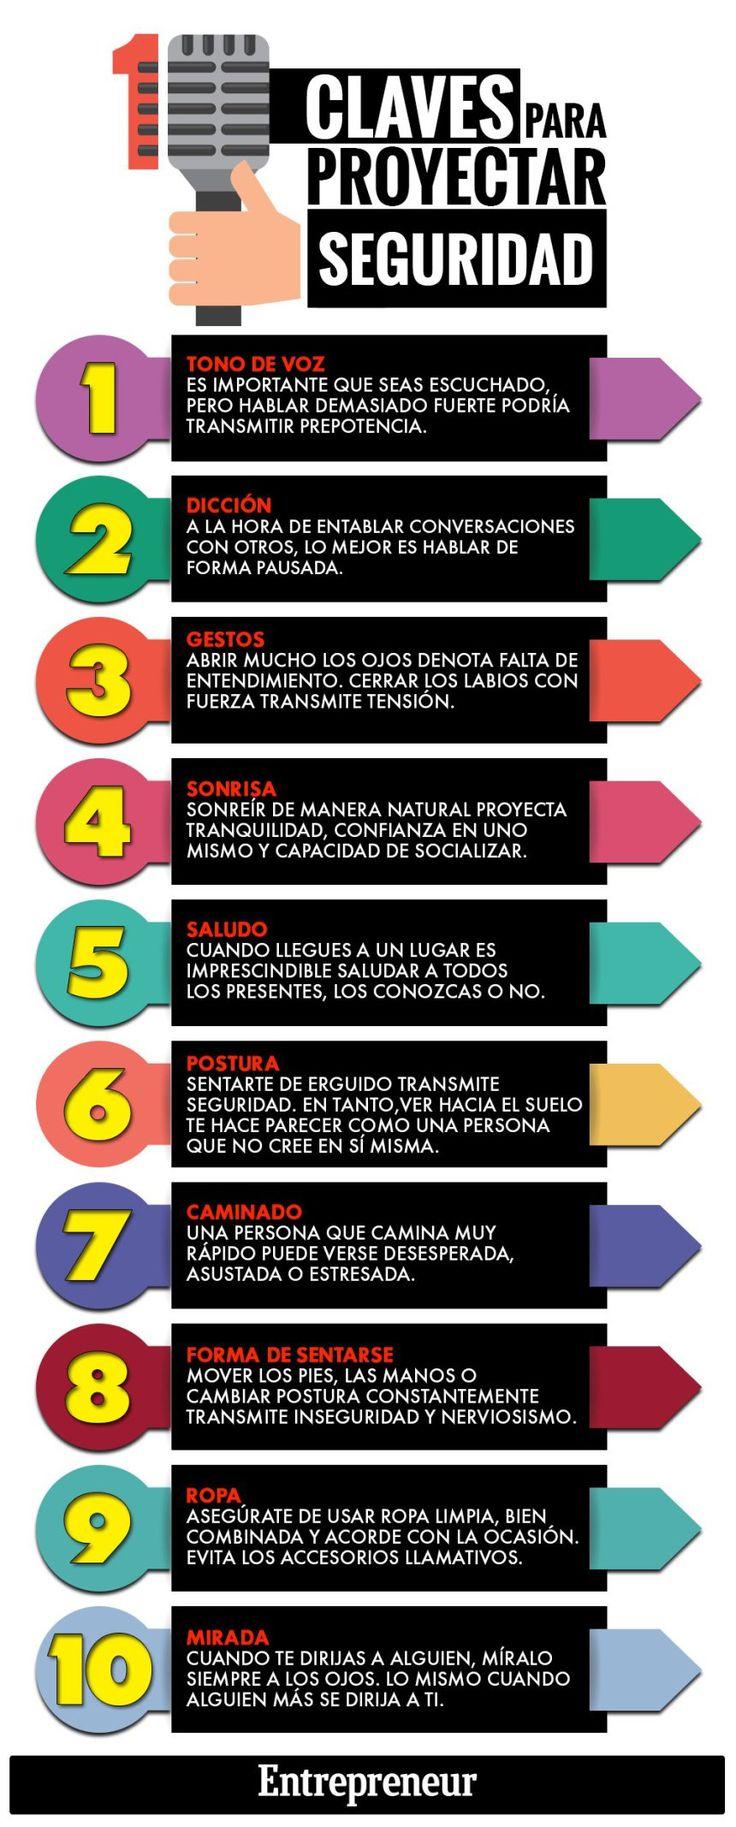 10 claves para proyectar seguridad #infografia